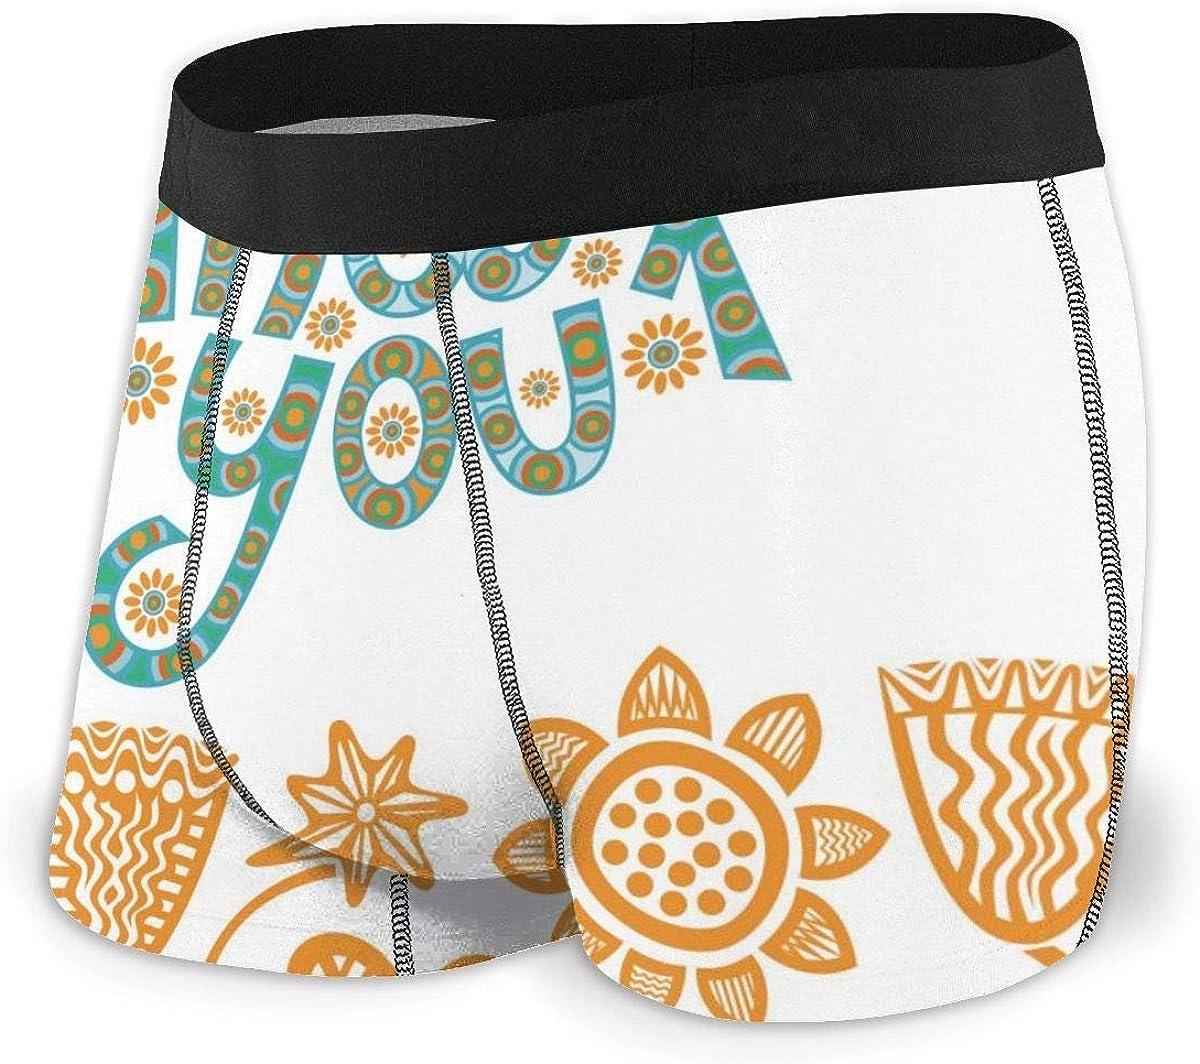 Randolph Wordsworth Mens Boxer Briefs Thank You Beautiful Cute Breathable Underwear